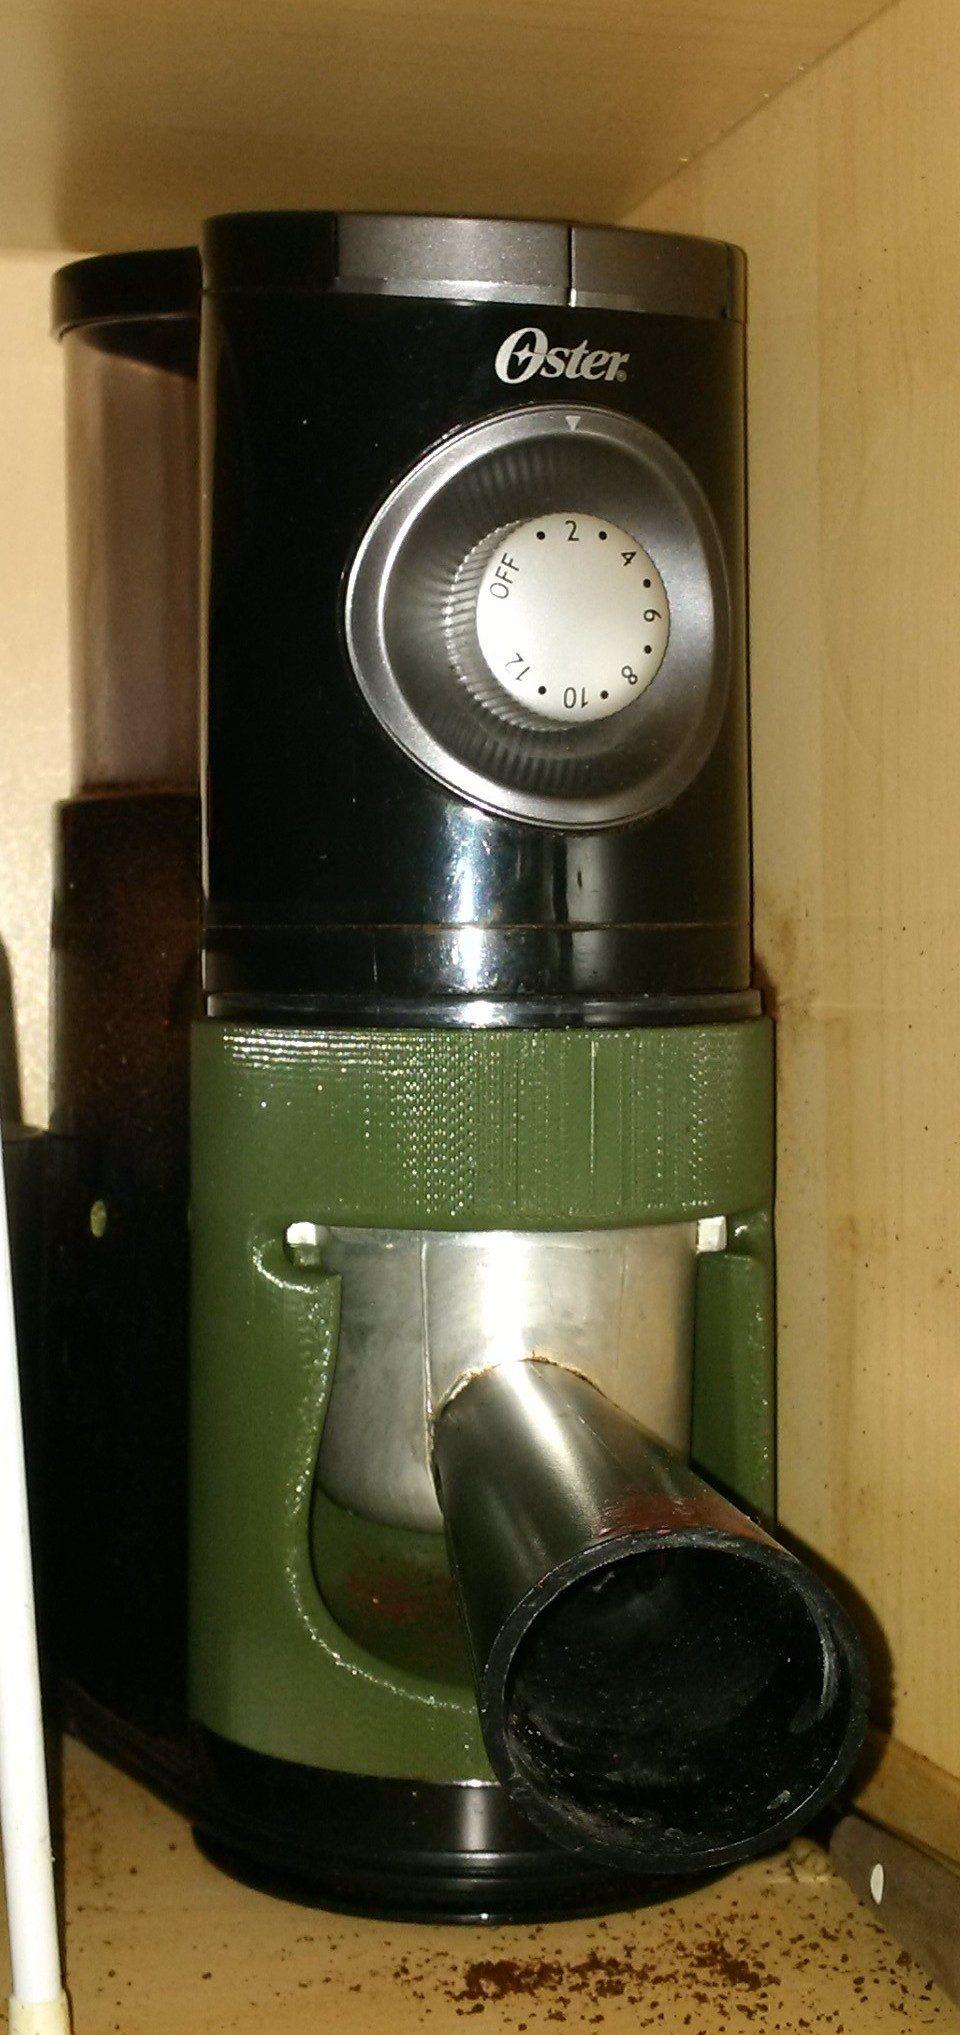 grounds cup holder in grinder